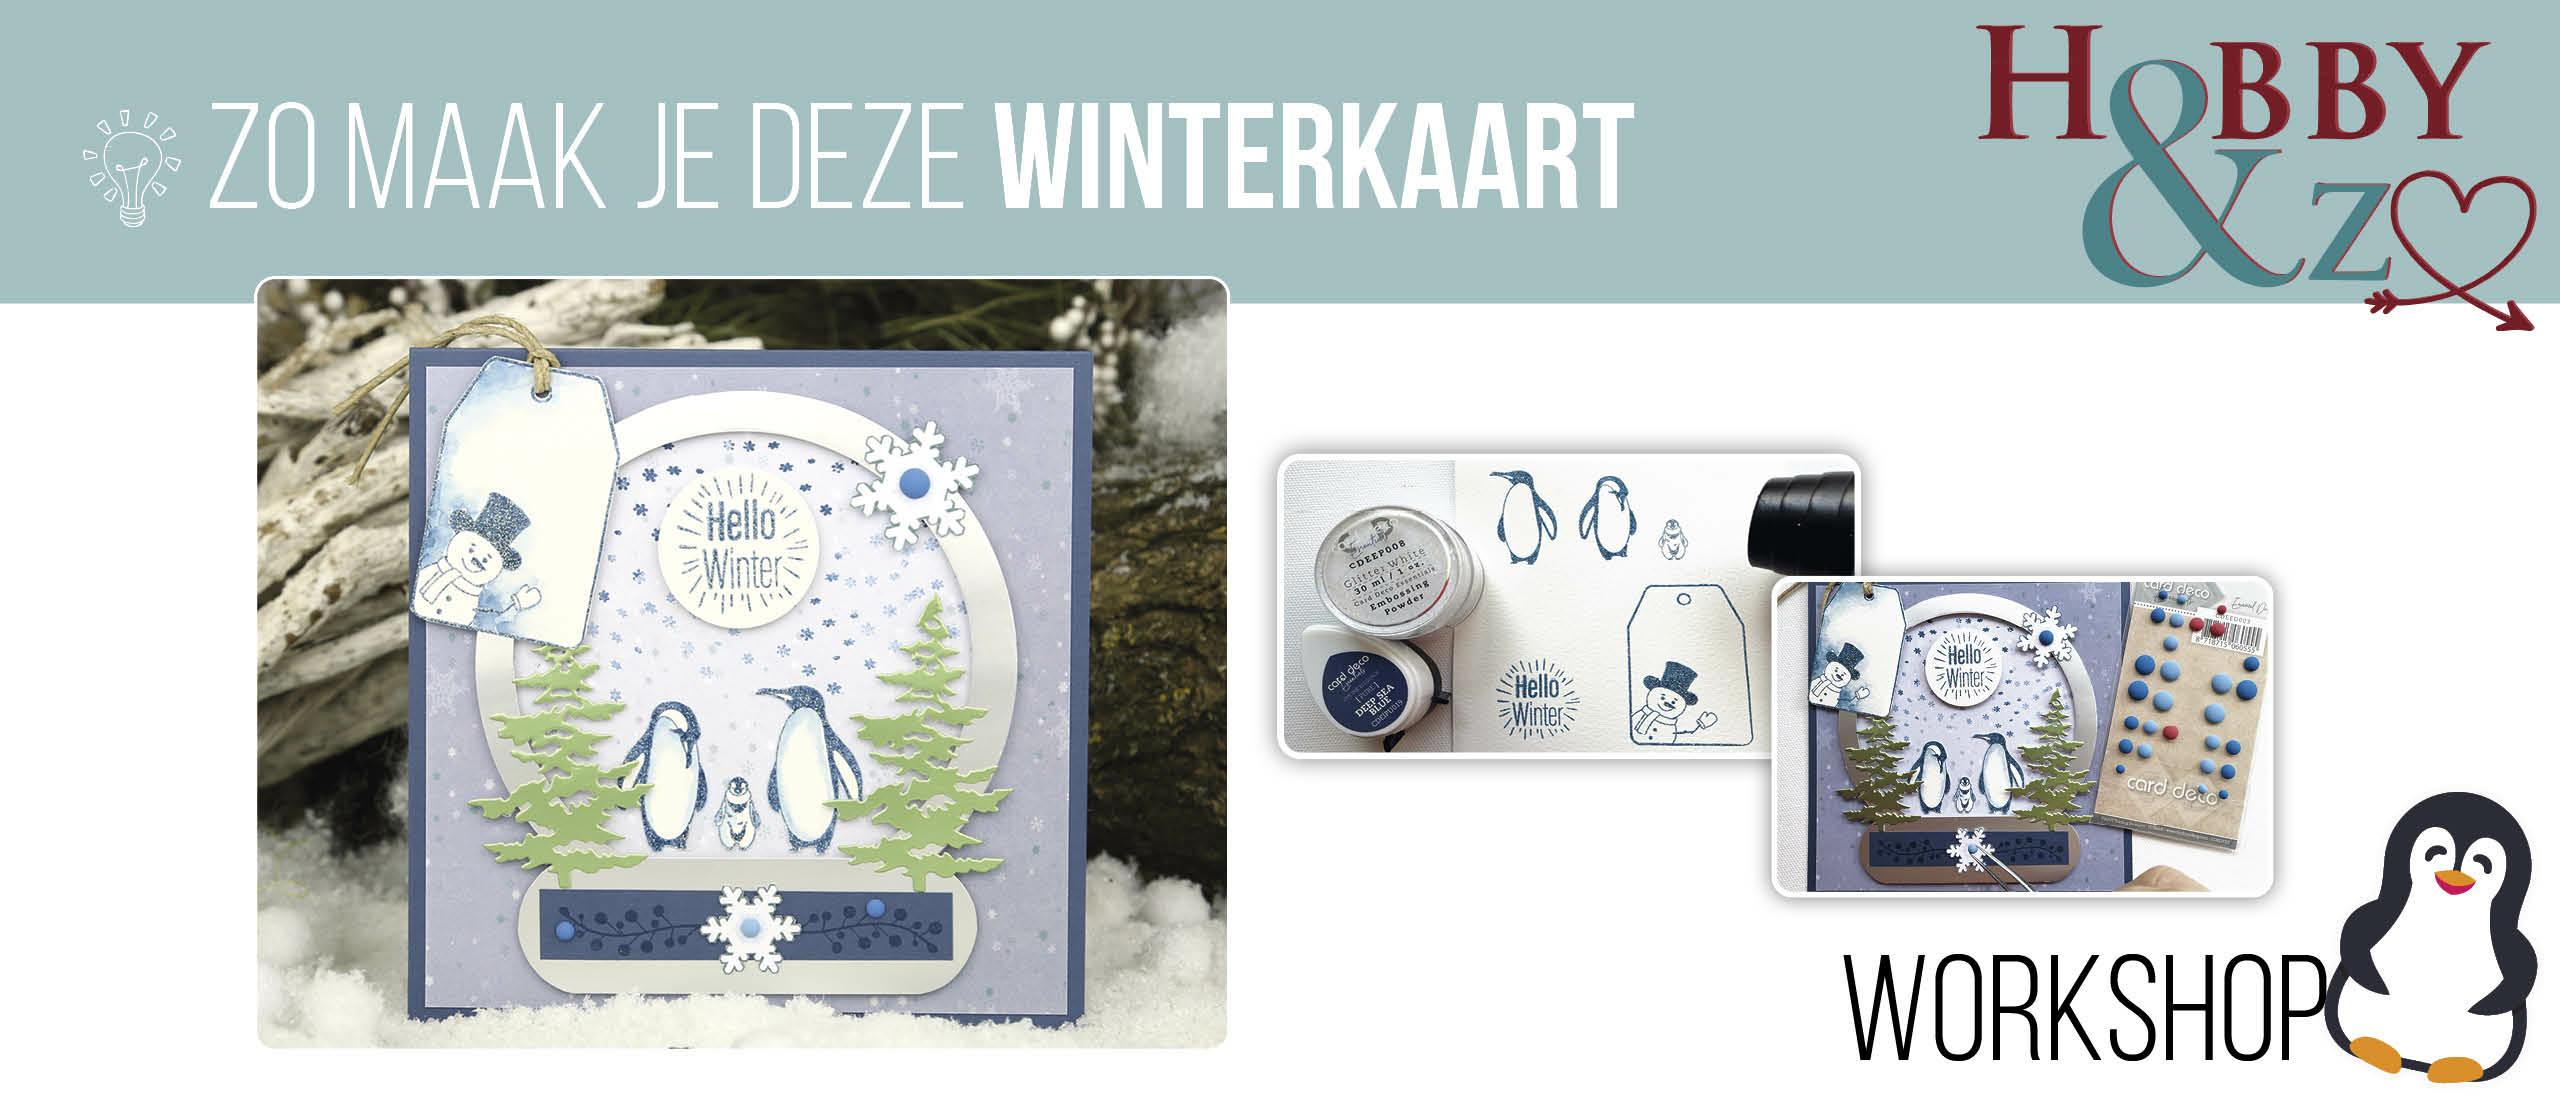 Masterclass Winterkaart met snowglobe en pinguïns p🐧